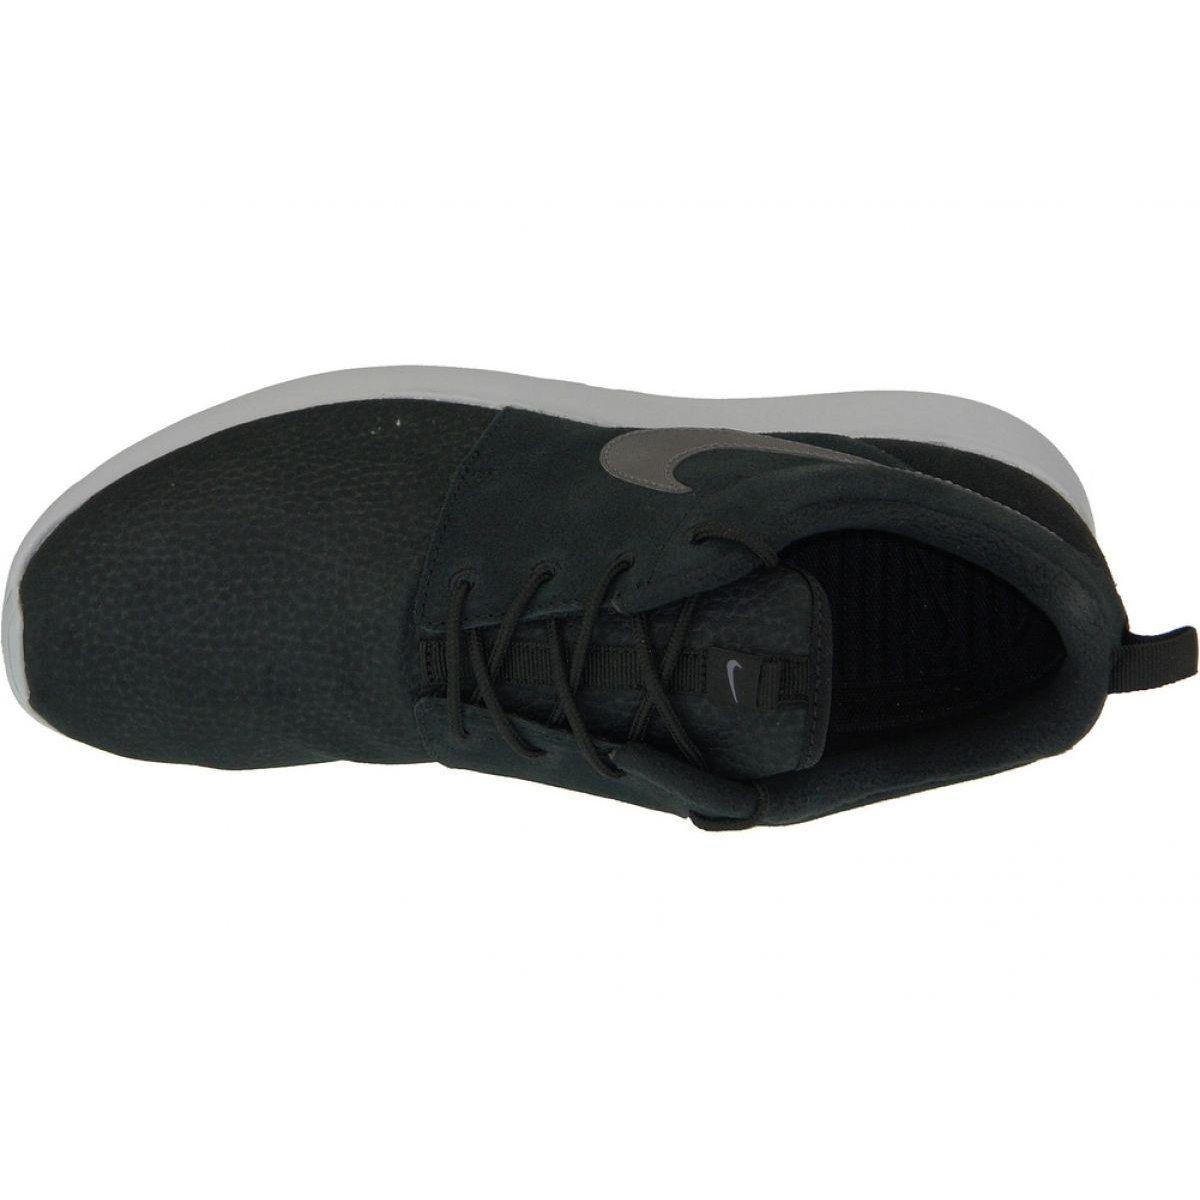 Buty Nike Roshe One Suede M 685280 001 Czarne Nike Roshe Sports Footwear Black Shoes